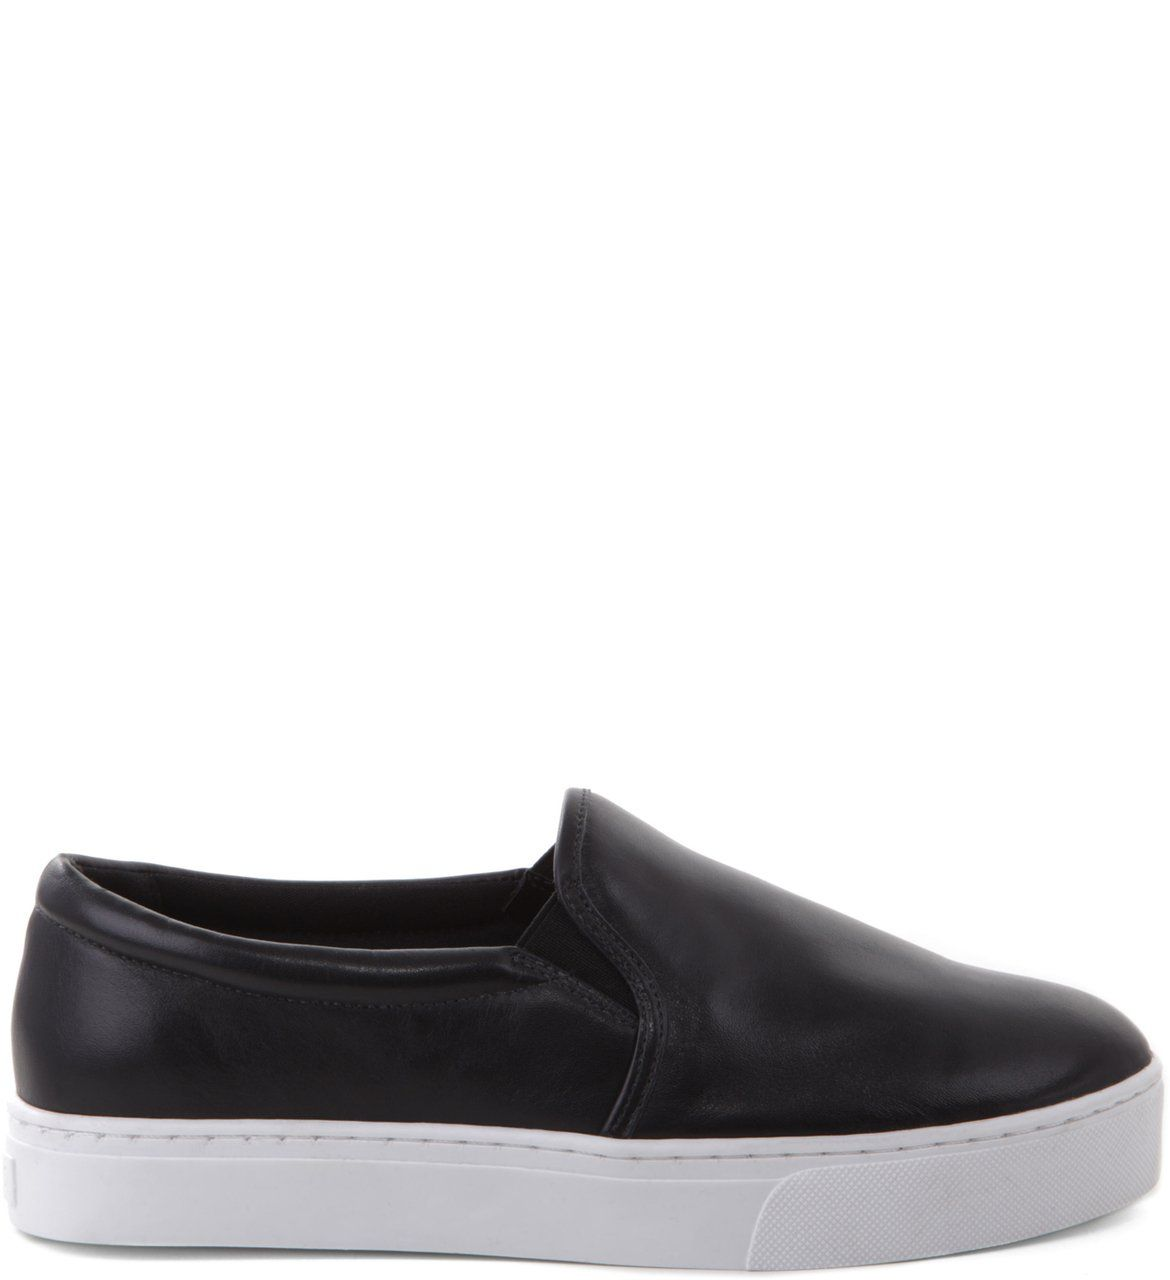 c628eefd4 Slip-on Couro Preto | SNEAKERS | Trainers, Shoes e Fashion